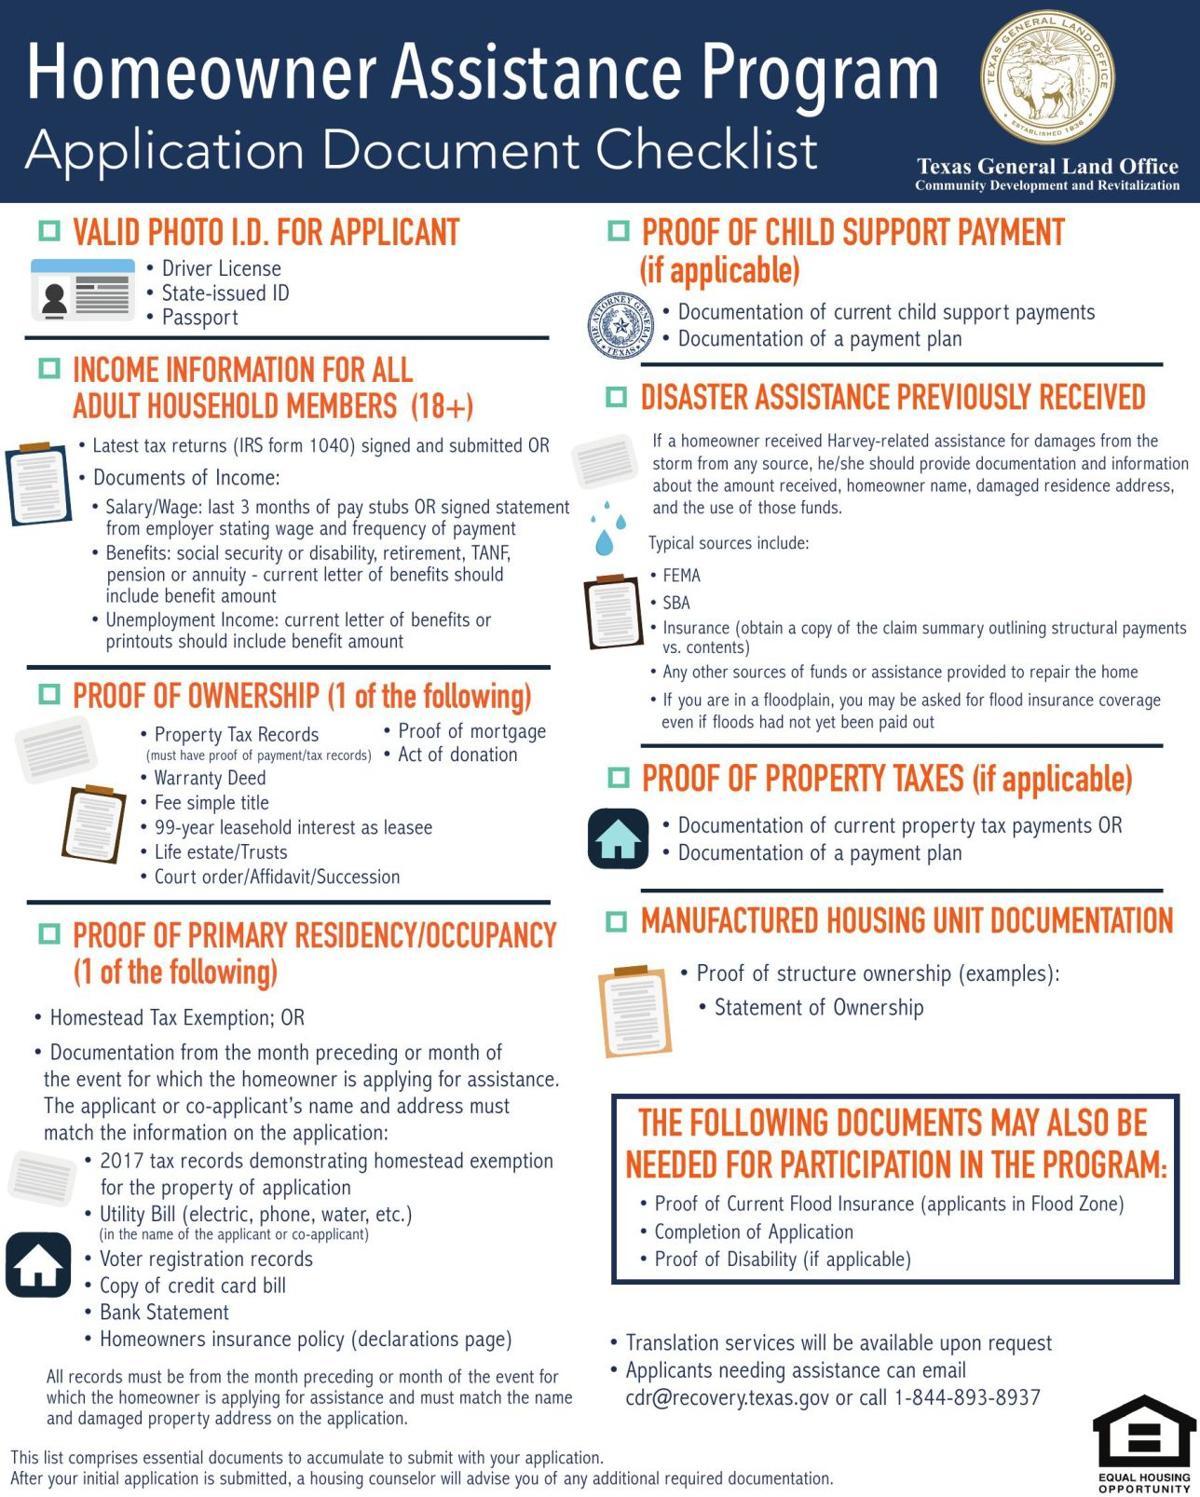 Homeowner Assistance Program checklist